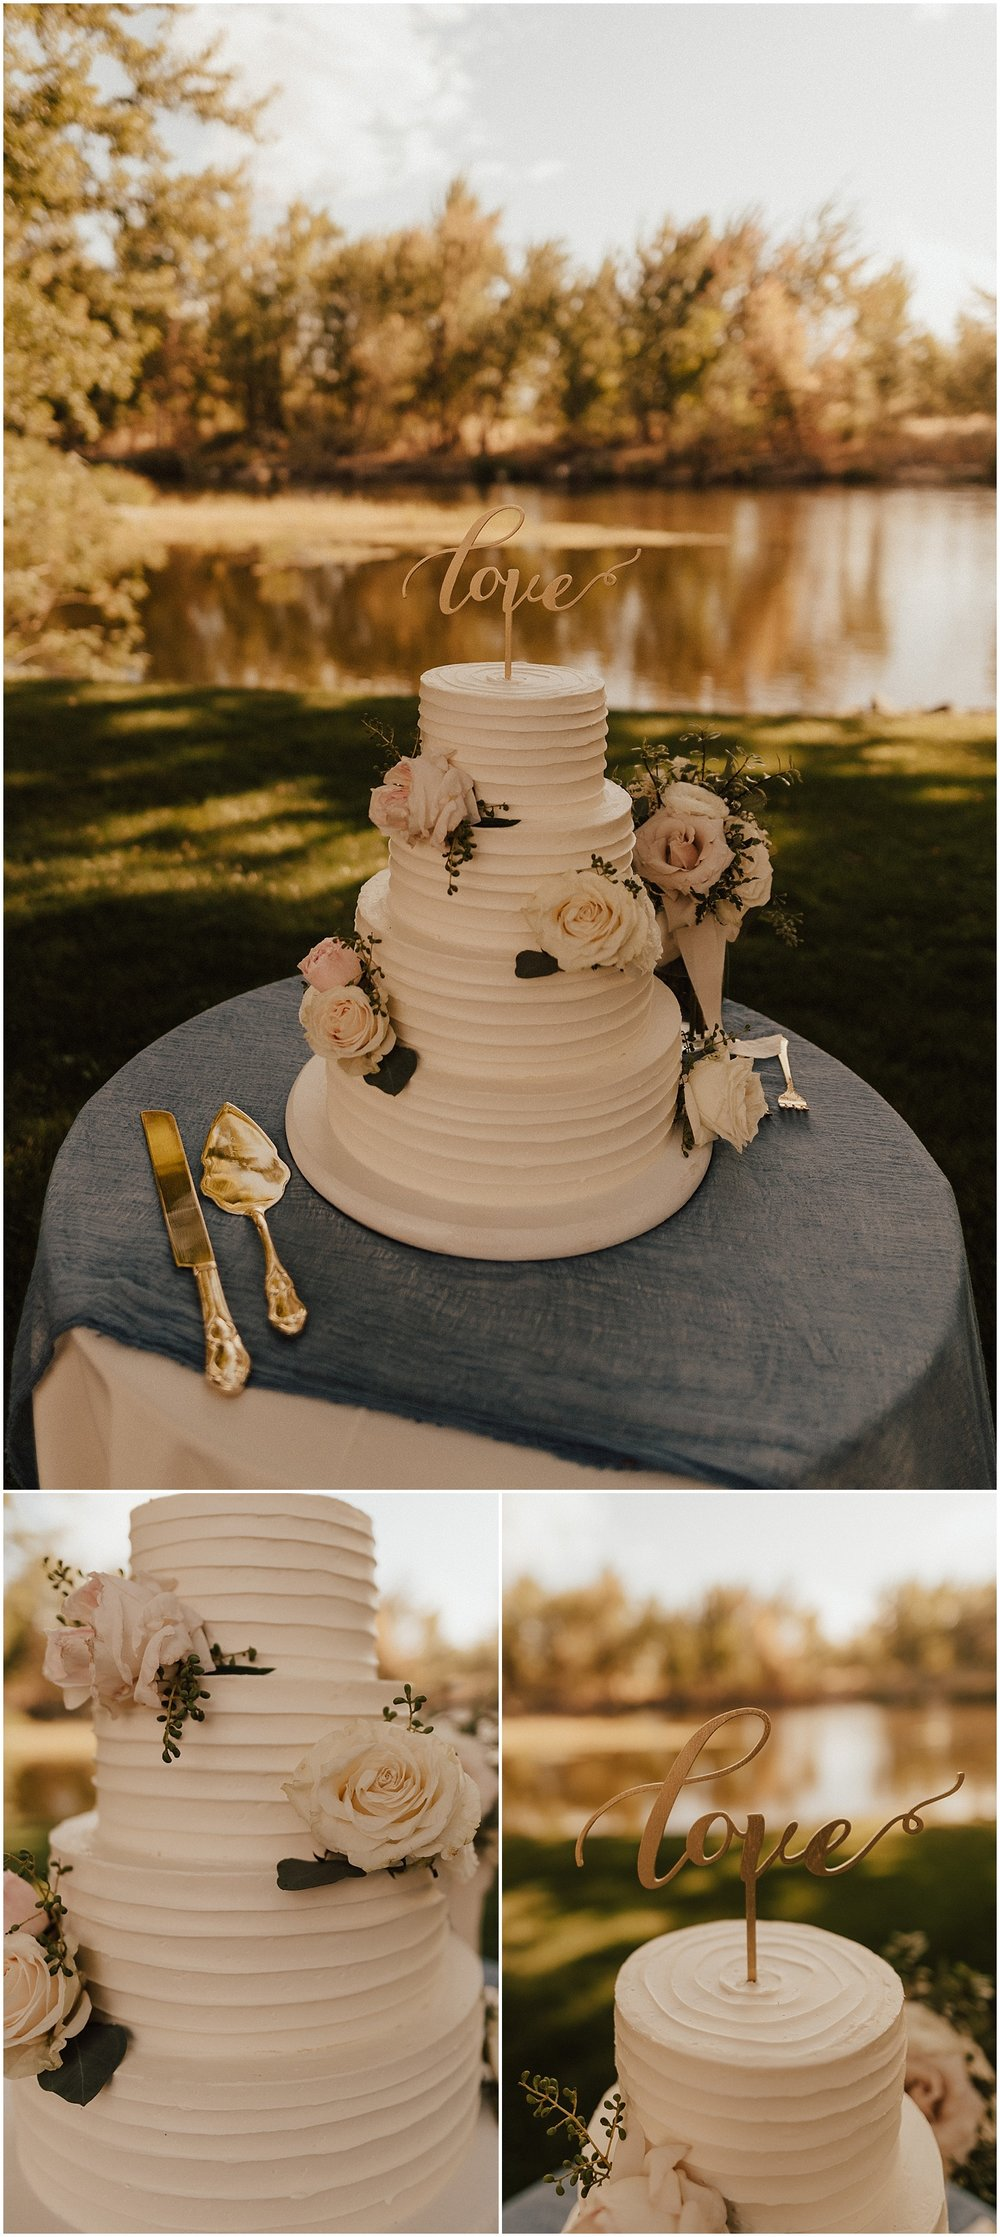 whimsical-summer-wedding-boise-idaho-las-vegas-bride106.jpg